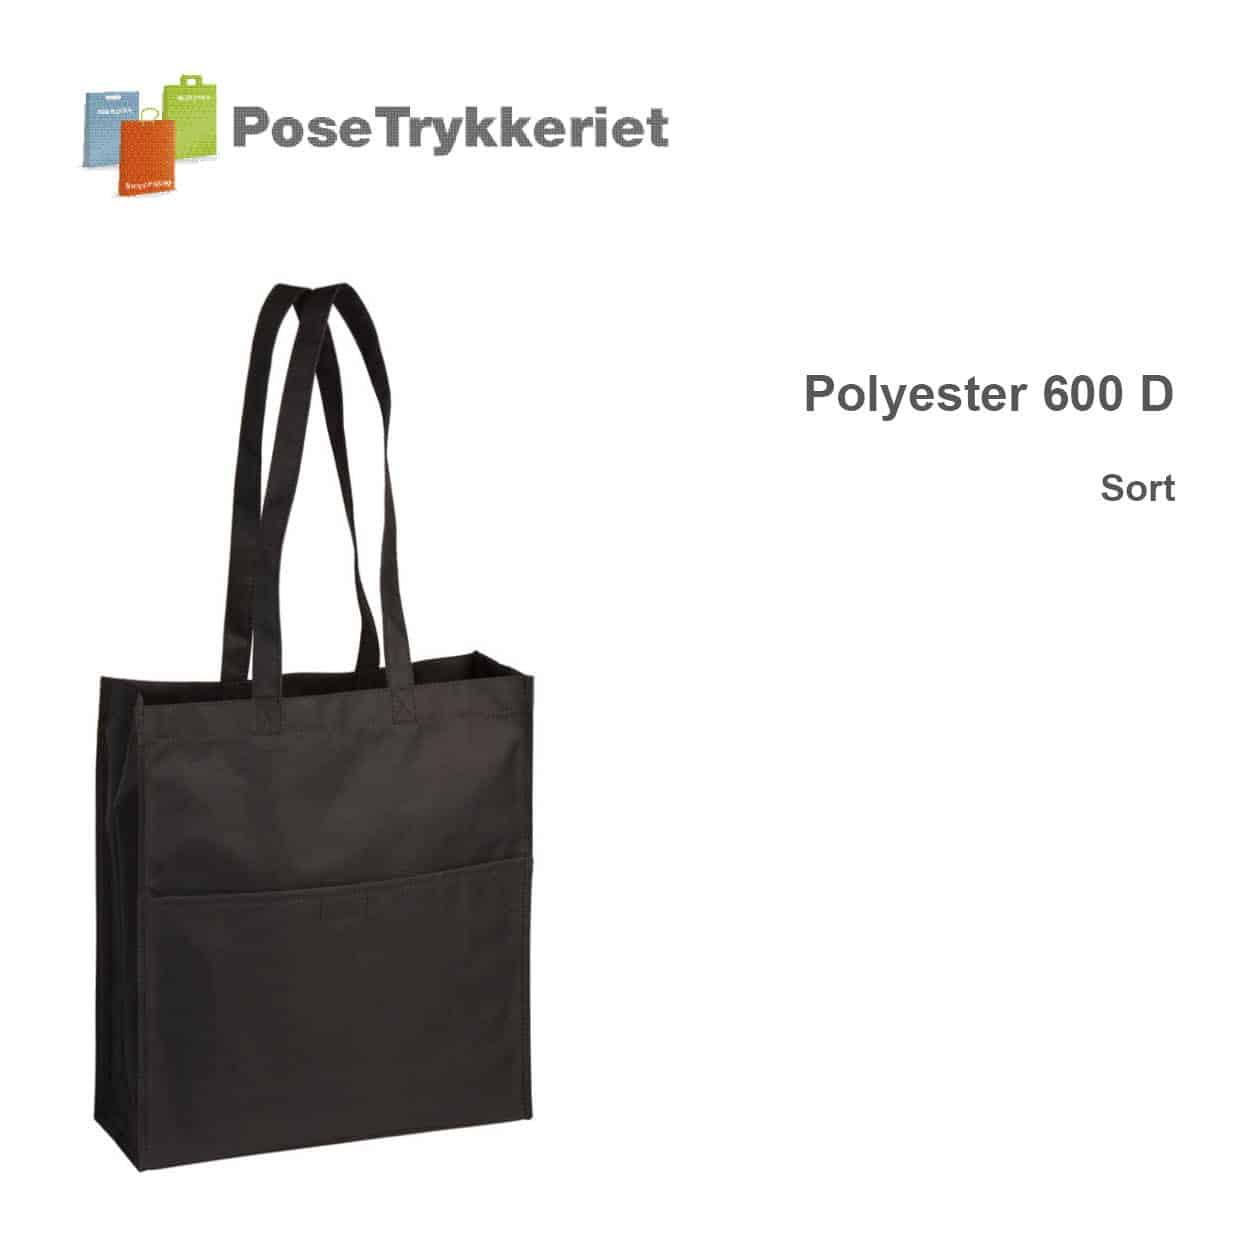 Revisorpose med lange hanke. 600 D. Sort. PoseTrykkeriet.dk